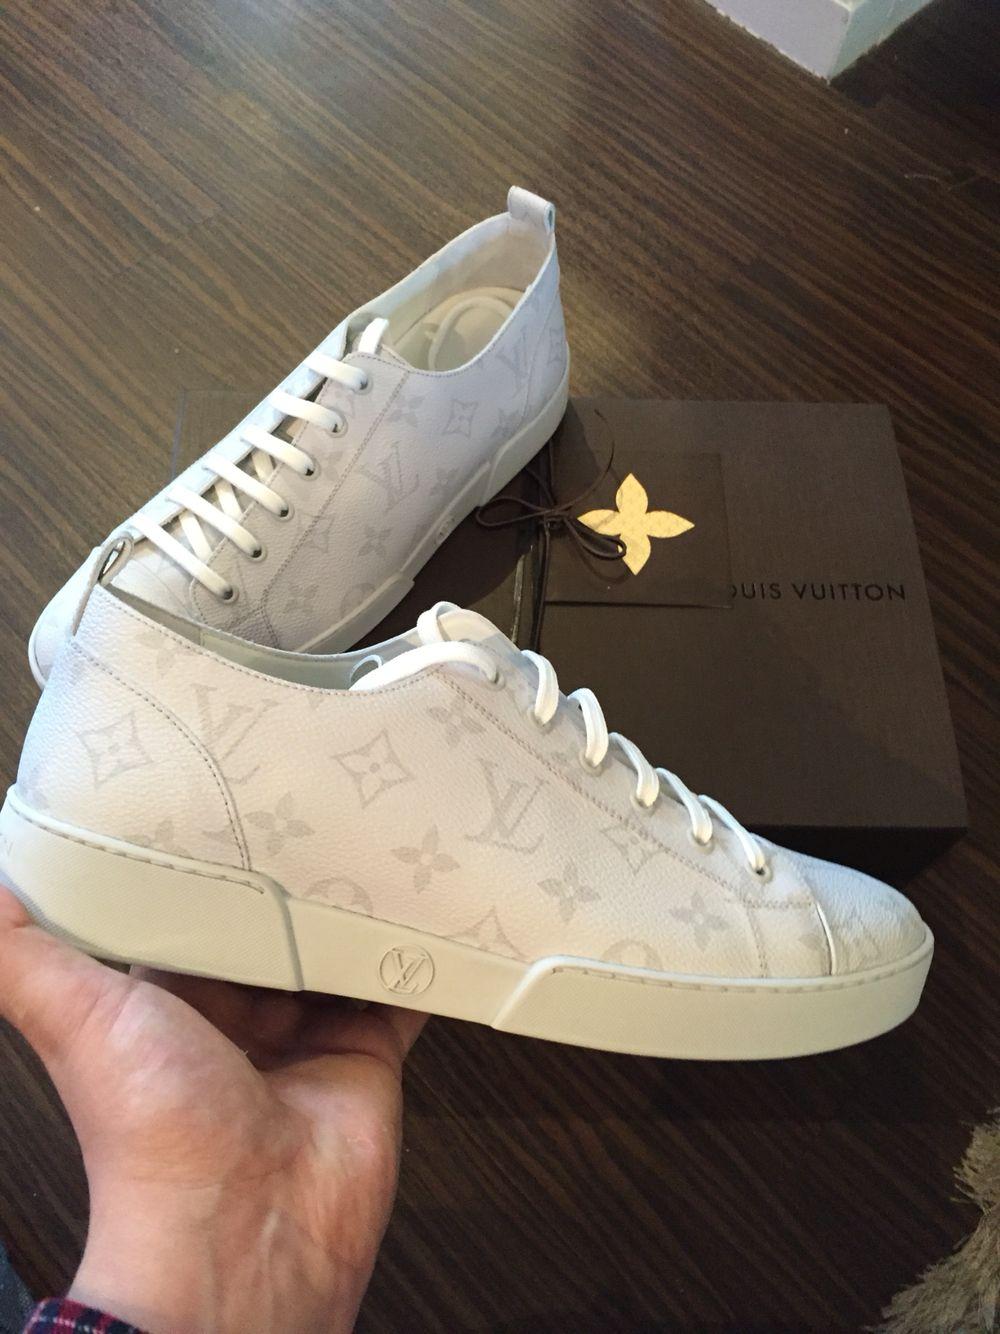 Buy louis vuitton sneakers uk